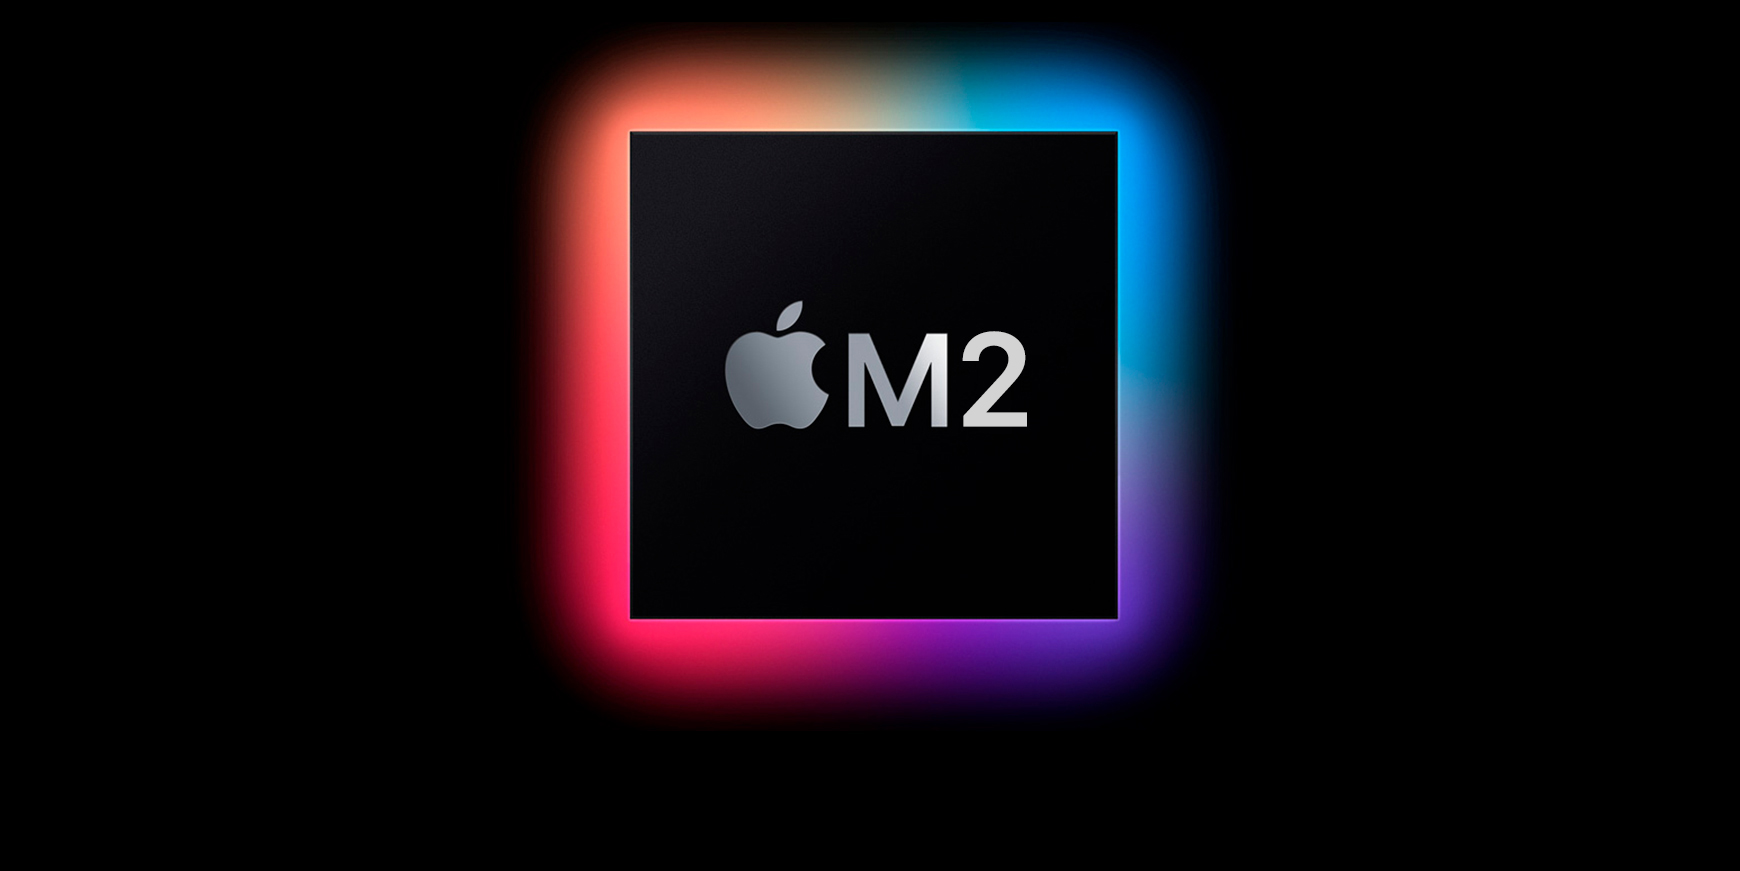 M2-chip